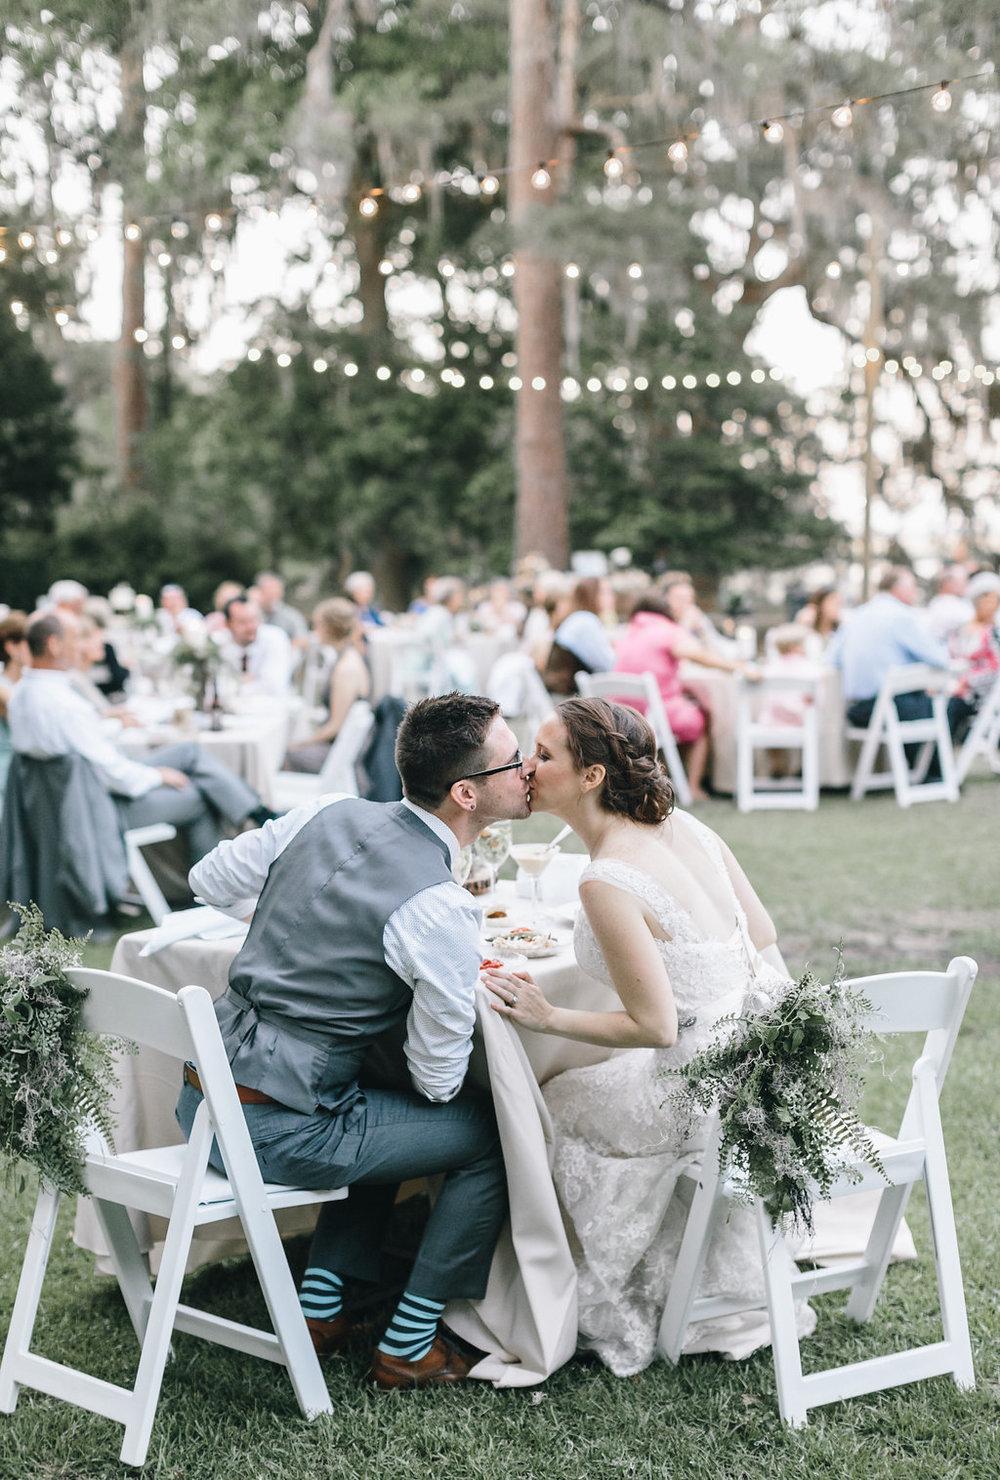 ember-and-adam-mackensey-alexander-dunham-farms-wedding-a-lowcountry-wedding-magazine-savannah-wedding-savannah-wedding-planner-cat-wedding-jenny-yoo-bridesmaids-bakers-pride-wedding-cake-southern-wedding-farm-wedding-ivory-and-beau-bridal-boutique-37.jpg